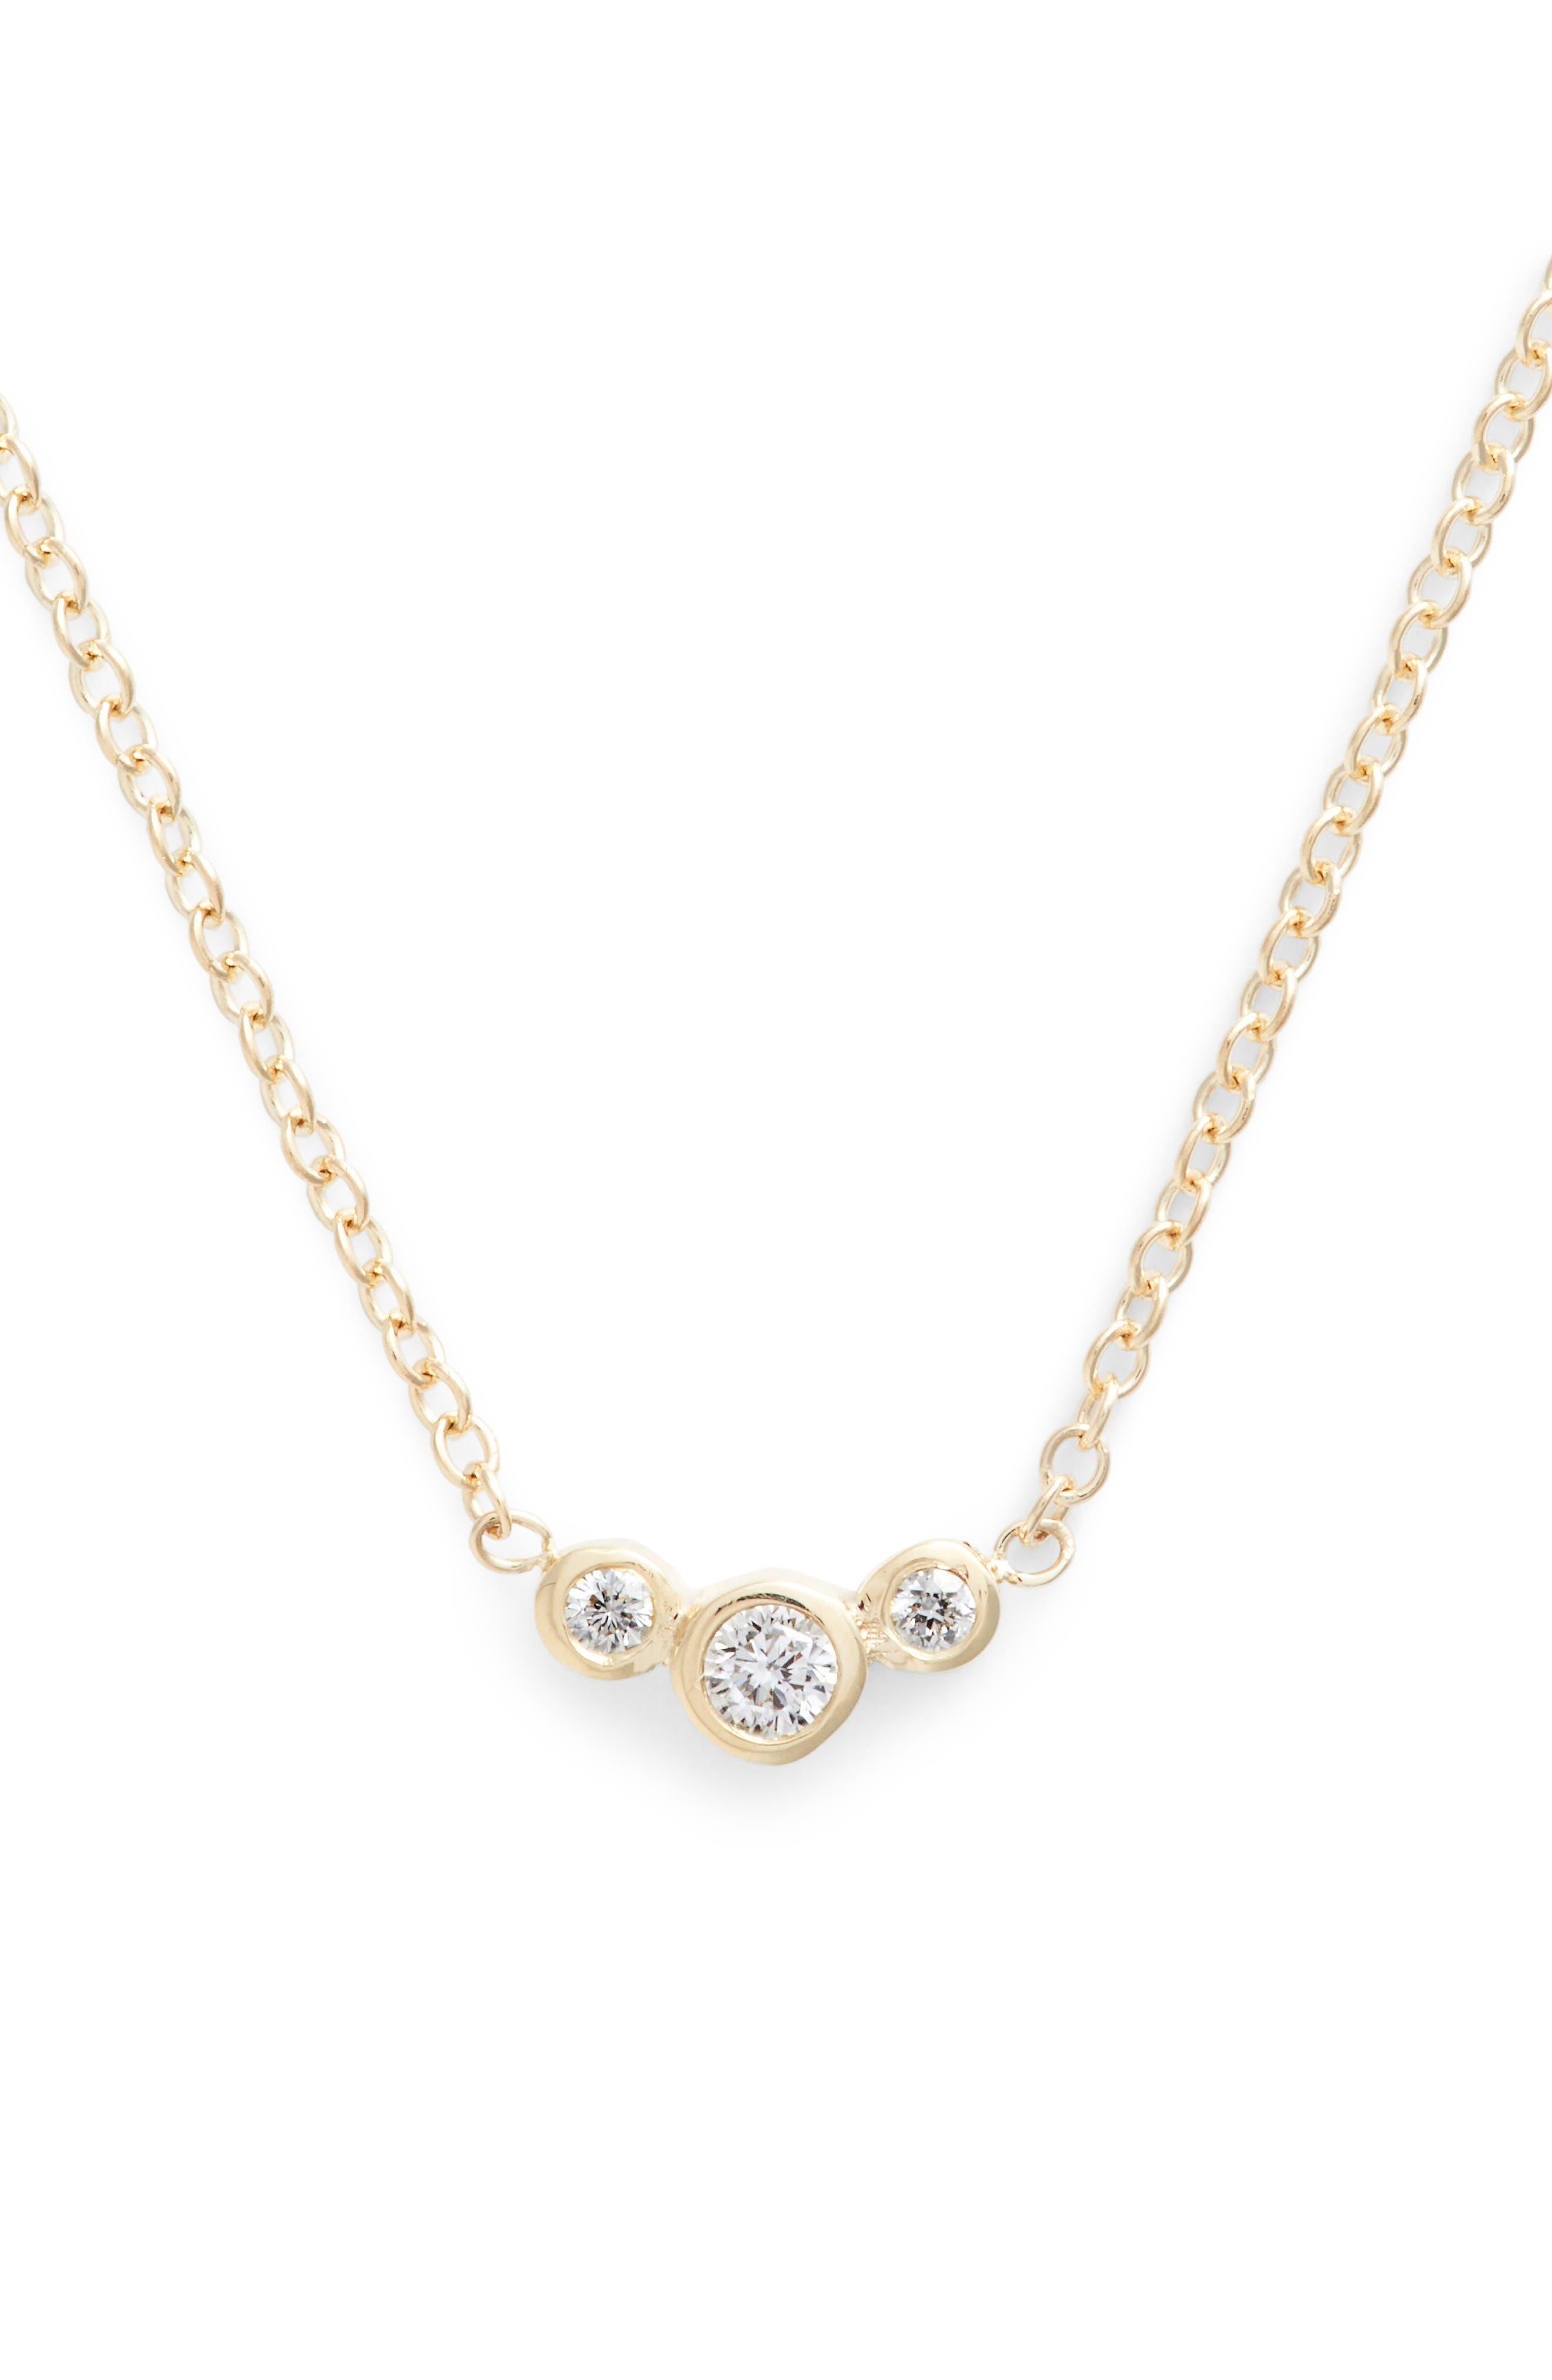 Zoe Chicco Curved 3-Diamond Bezel Pendant Necklace